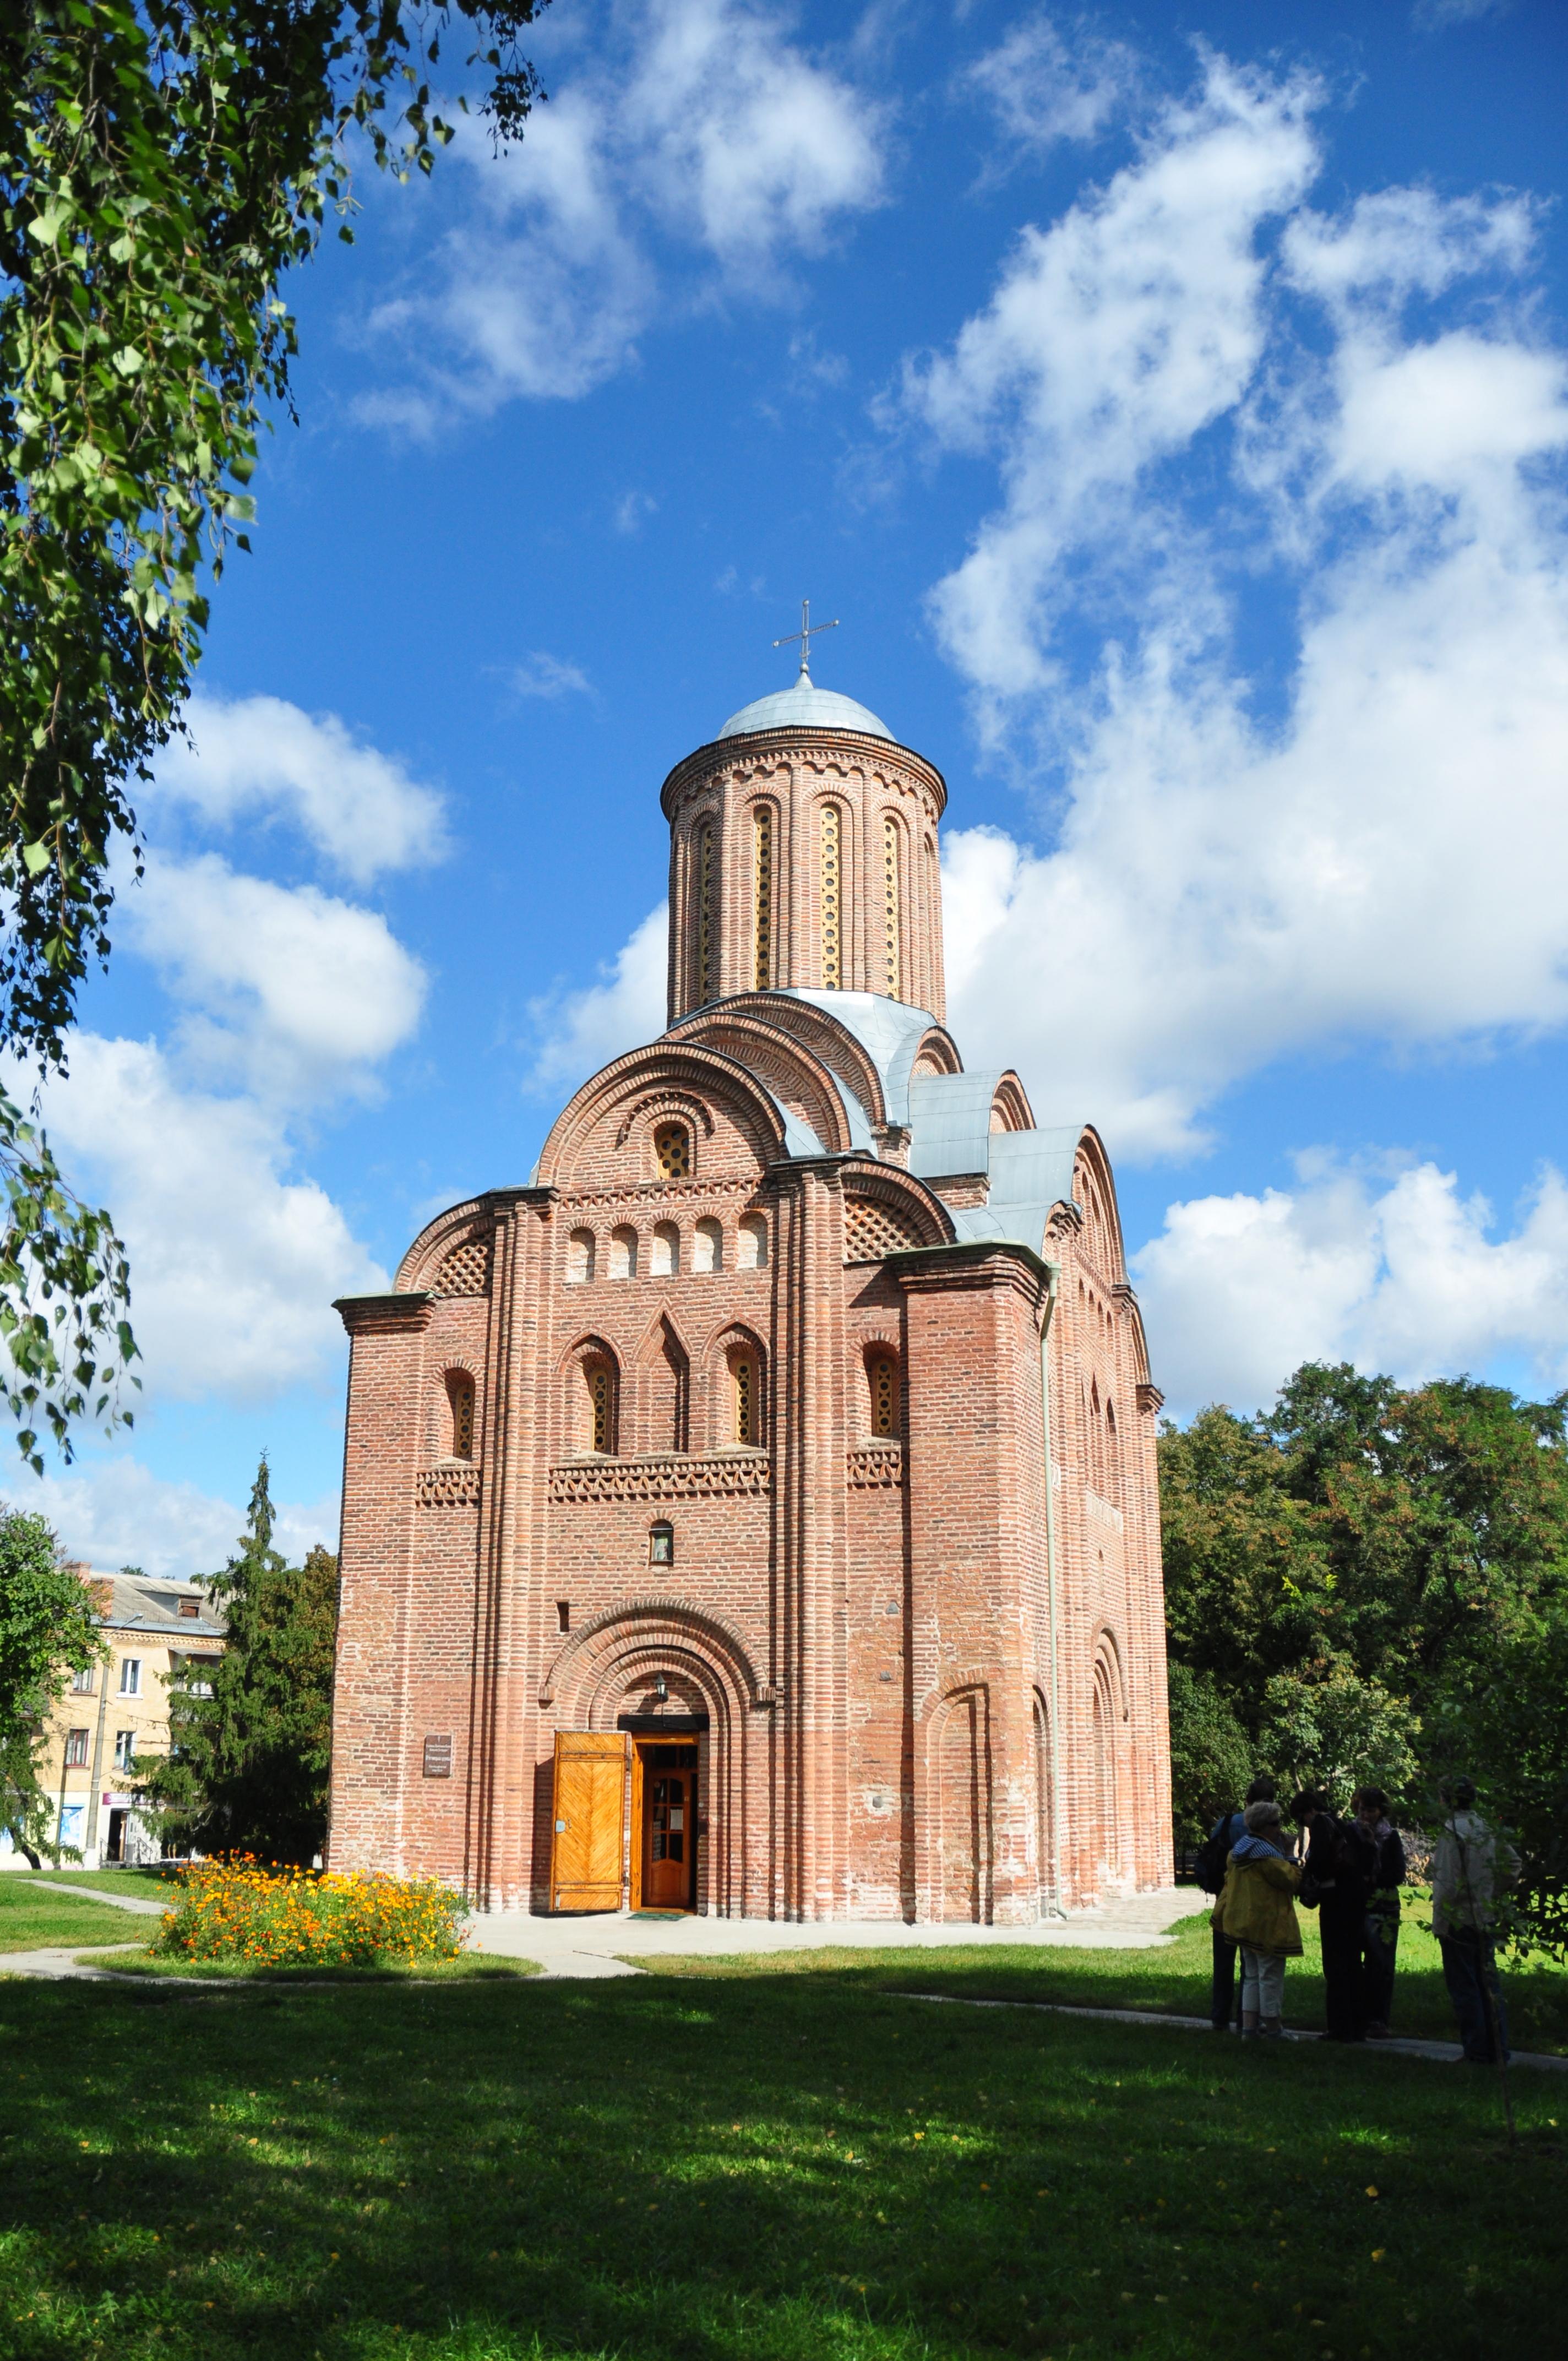 File:П'ятницька церква в Чернігові.JPG - Wikimedia Commons